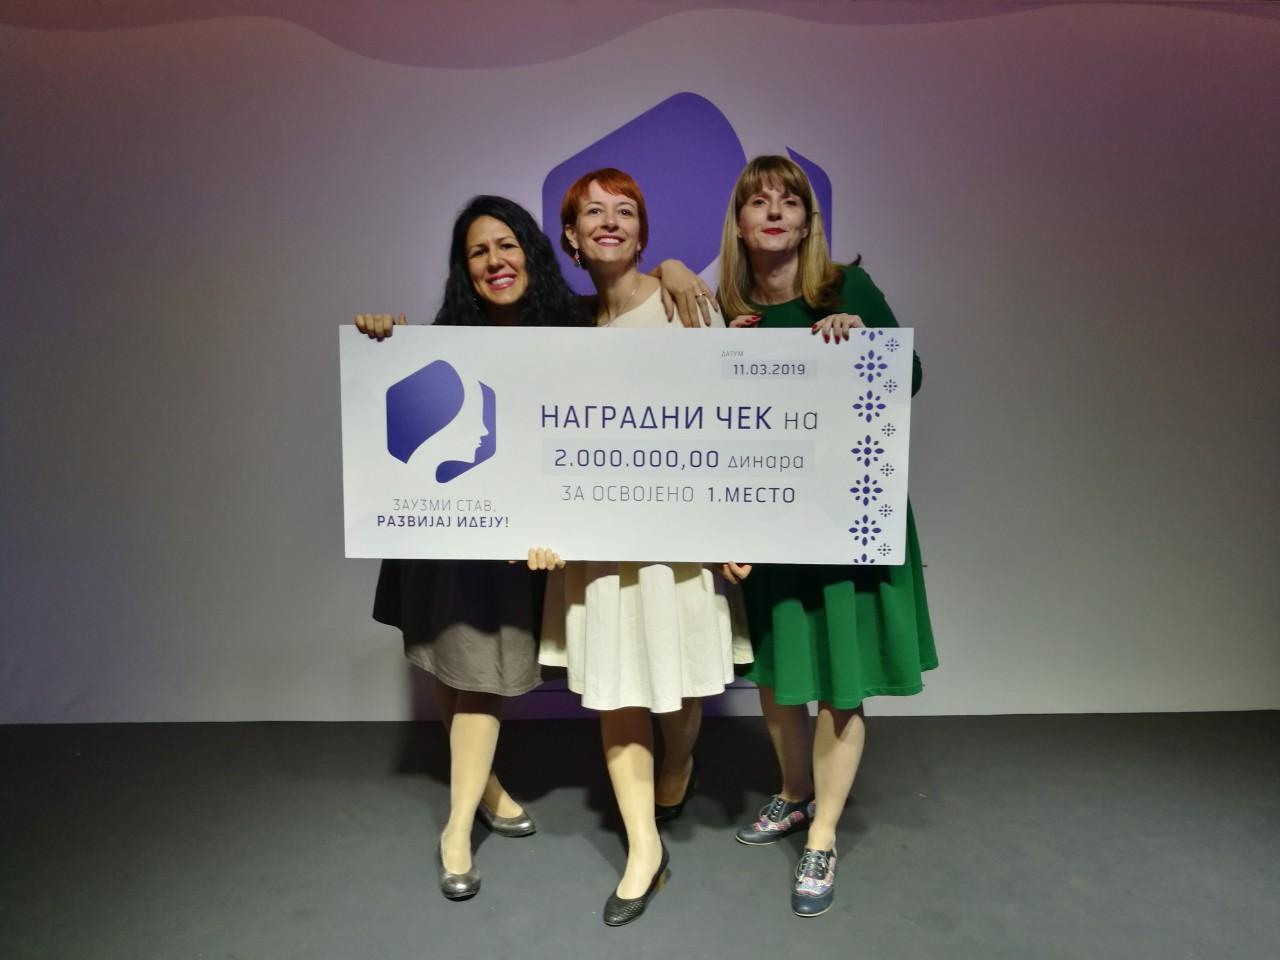 Najbolja ženska inovacija je proivod HerbELICO kompanije HerbELIXA